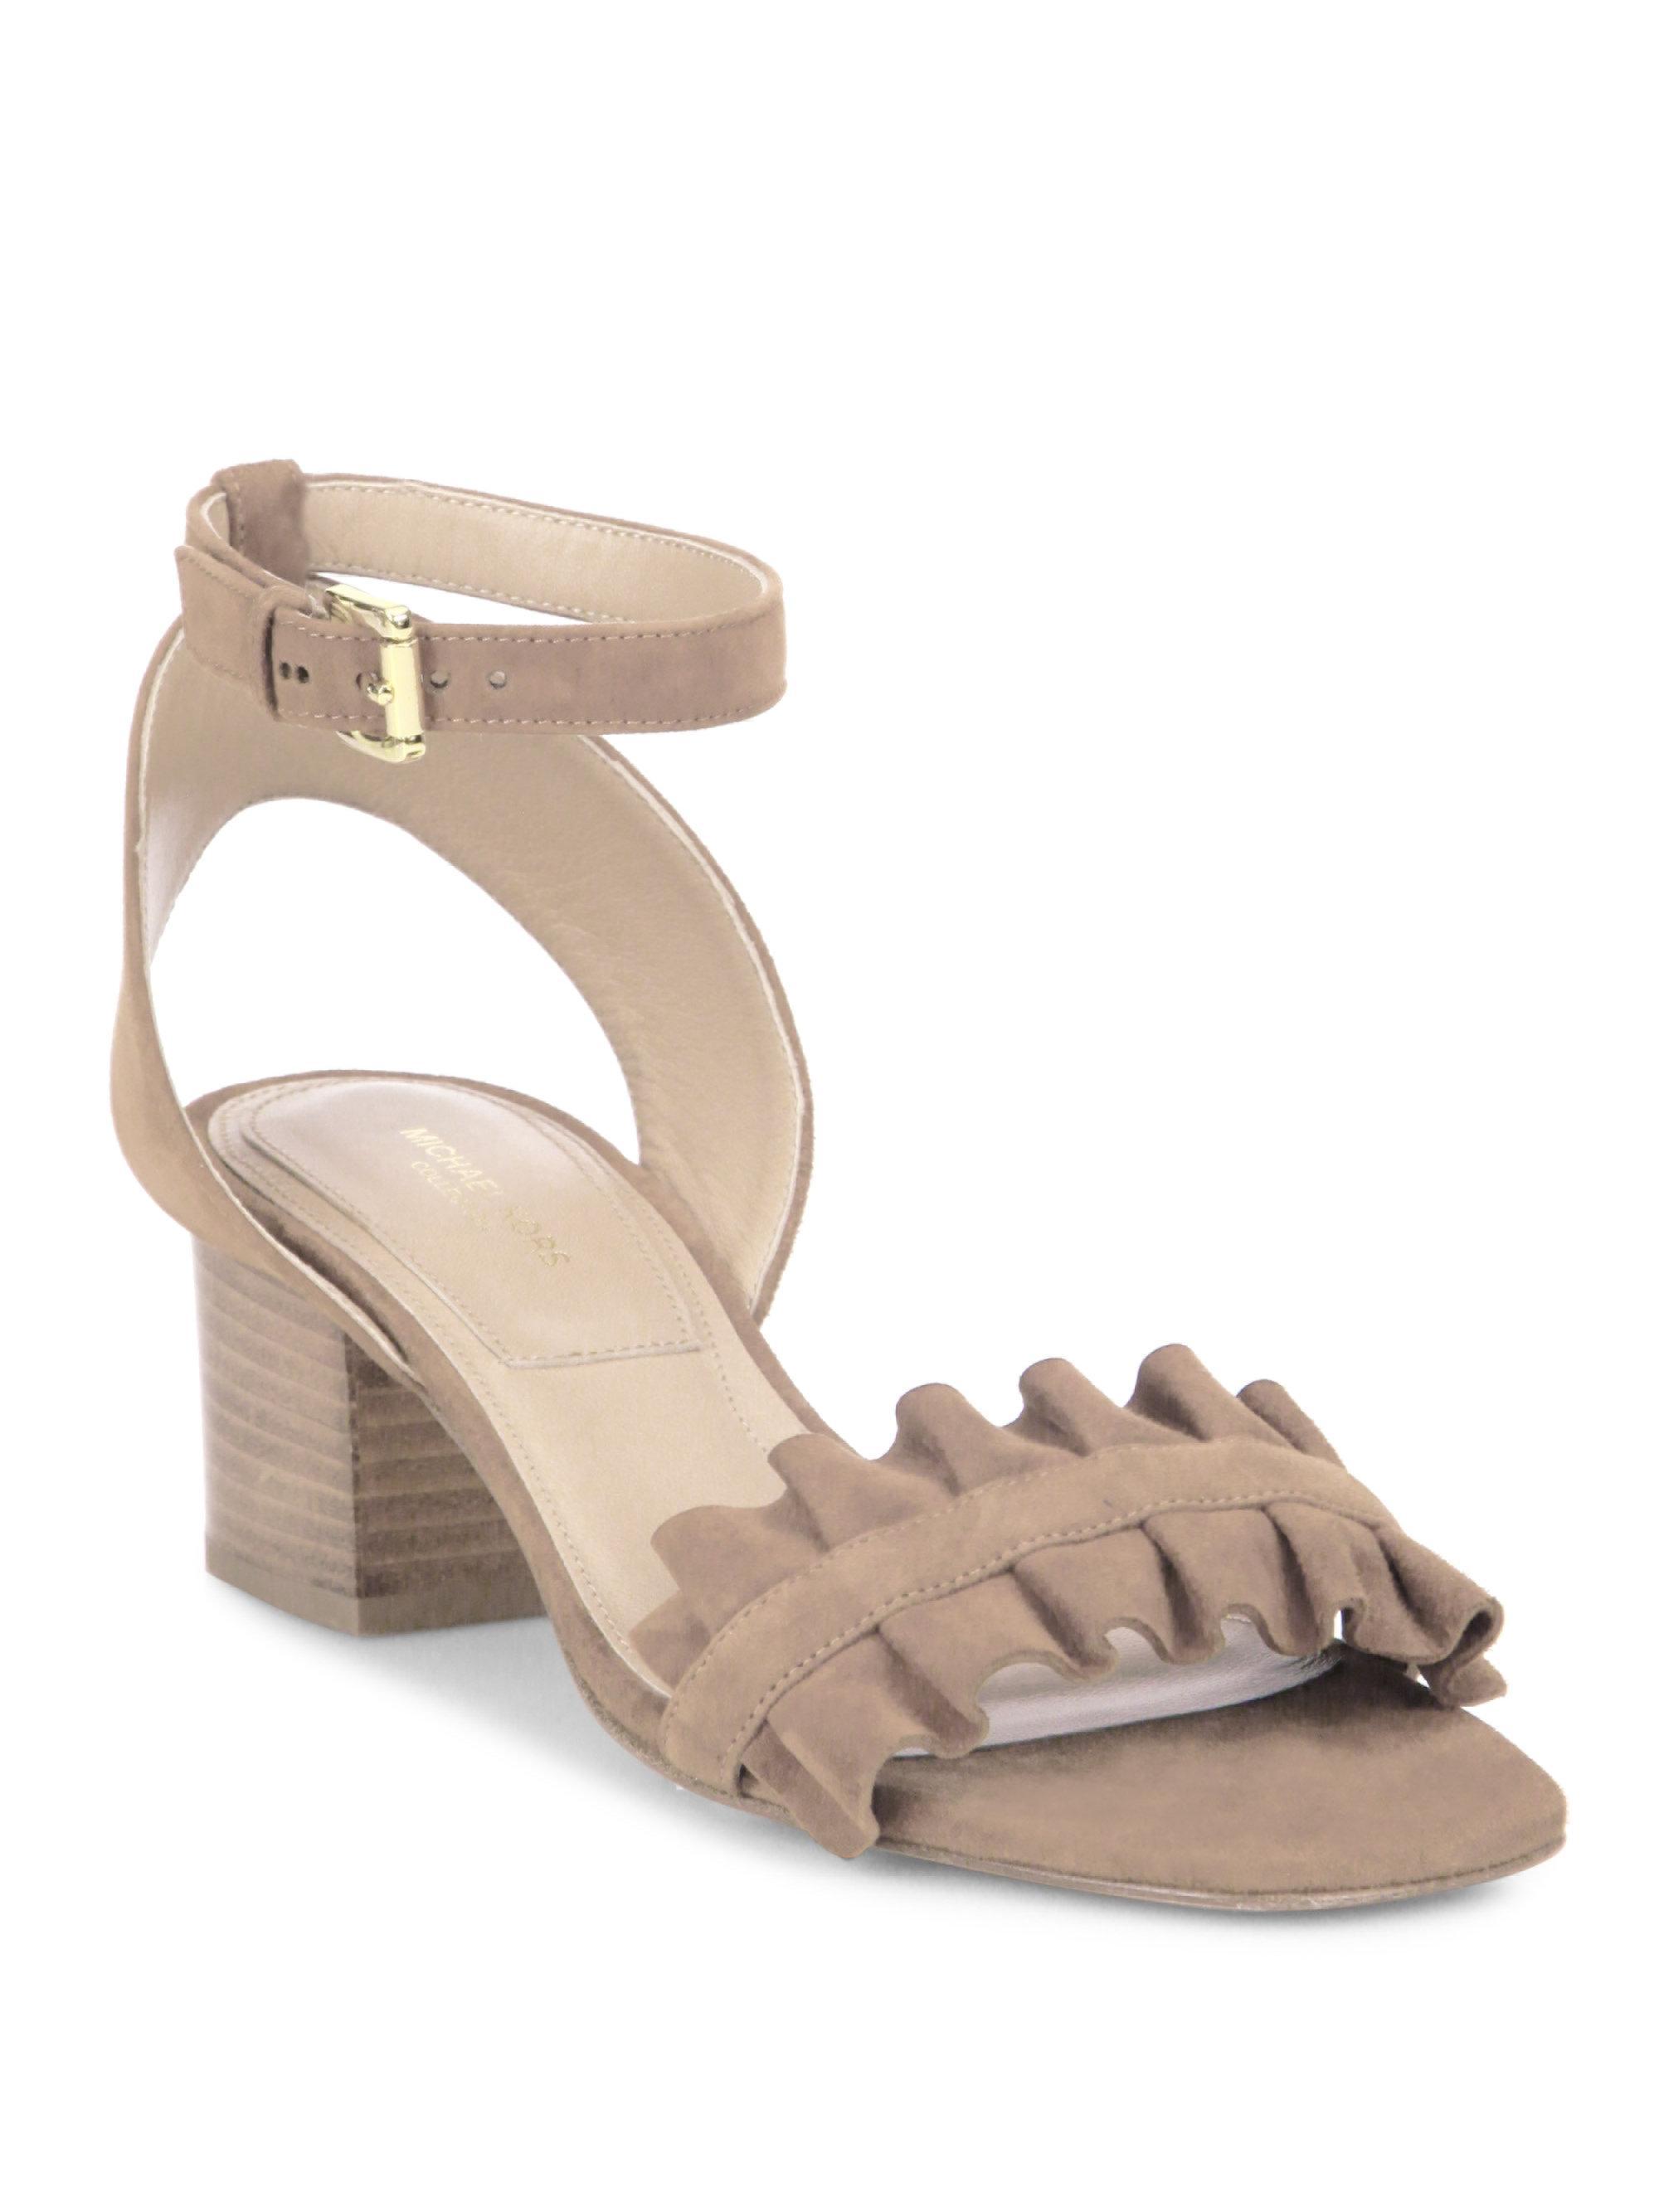 9836fa2a9a95 Michael Kors. Women s Monroe Suede Ankle-strap Sandals